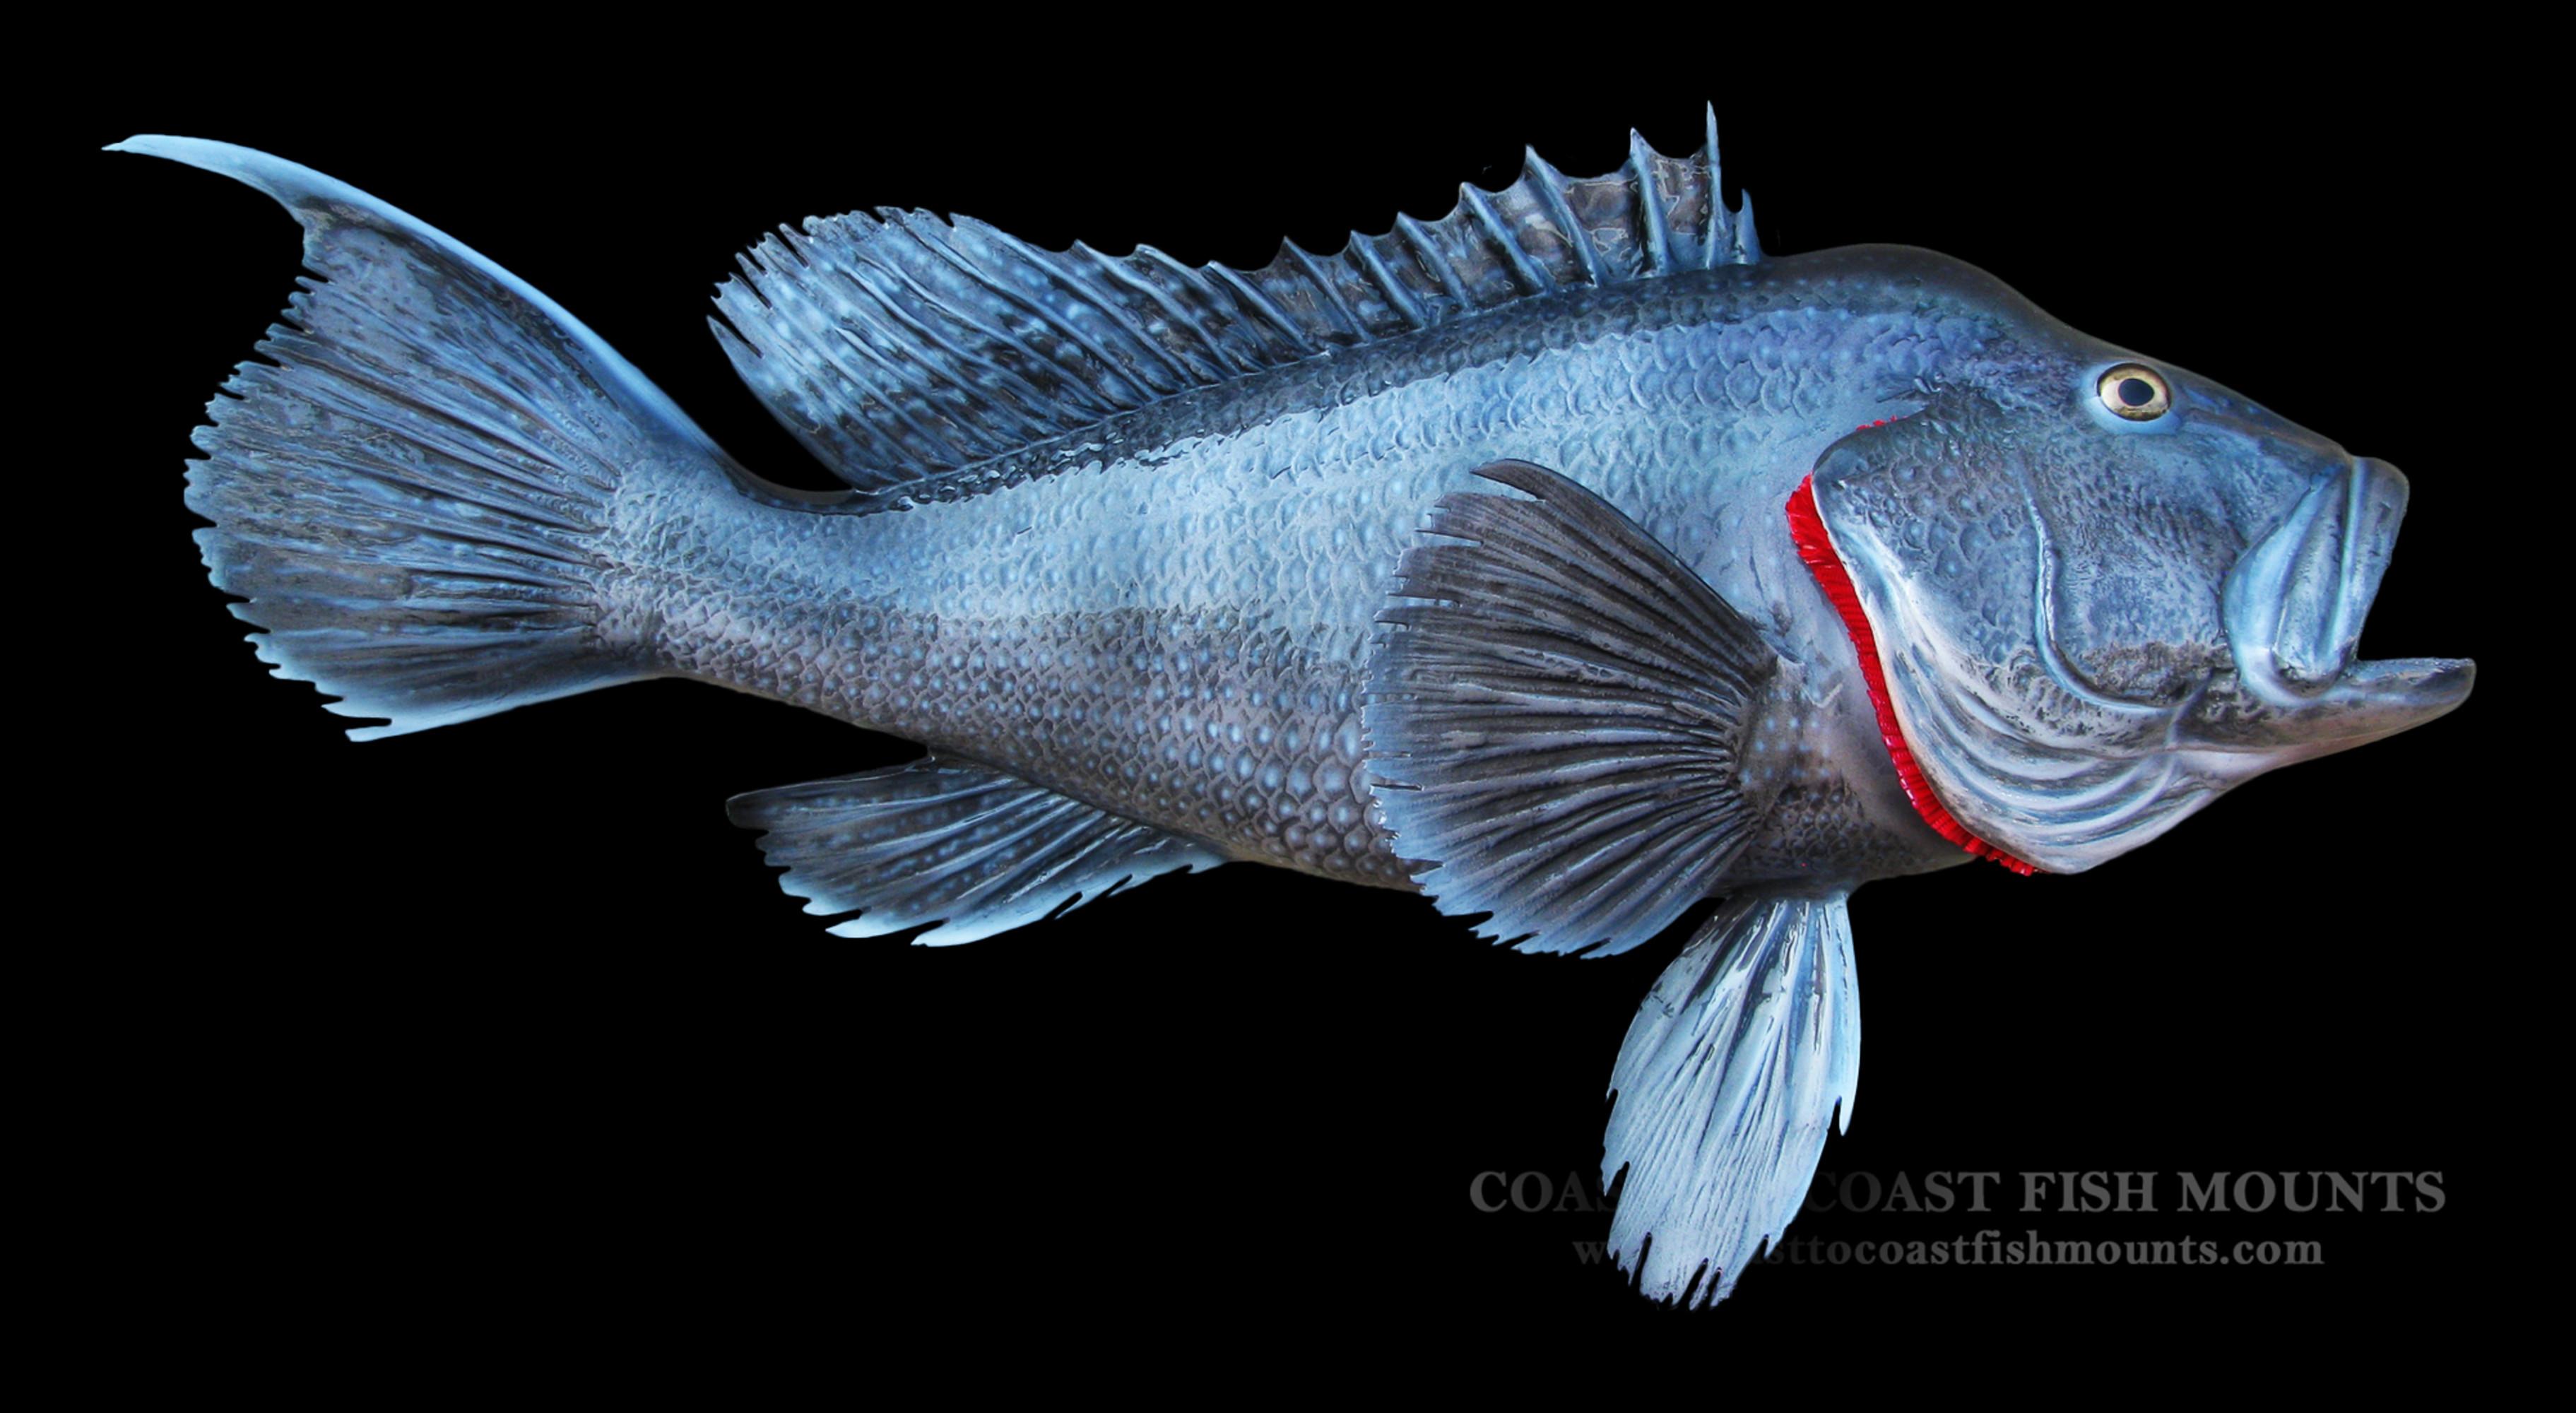 Sea bass fish mount and fish replicas coast to coast for Replica fish mounts